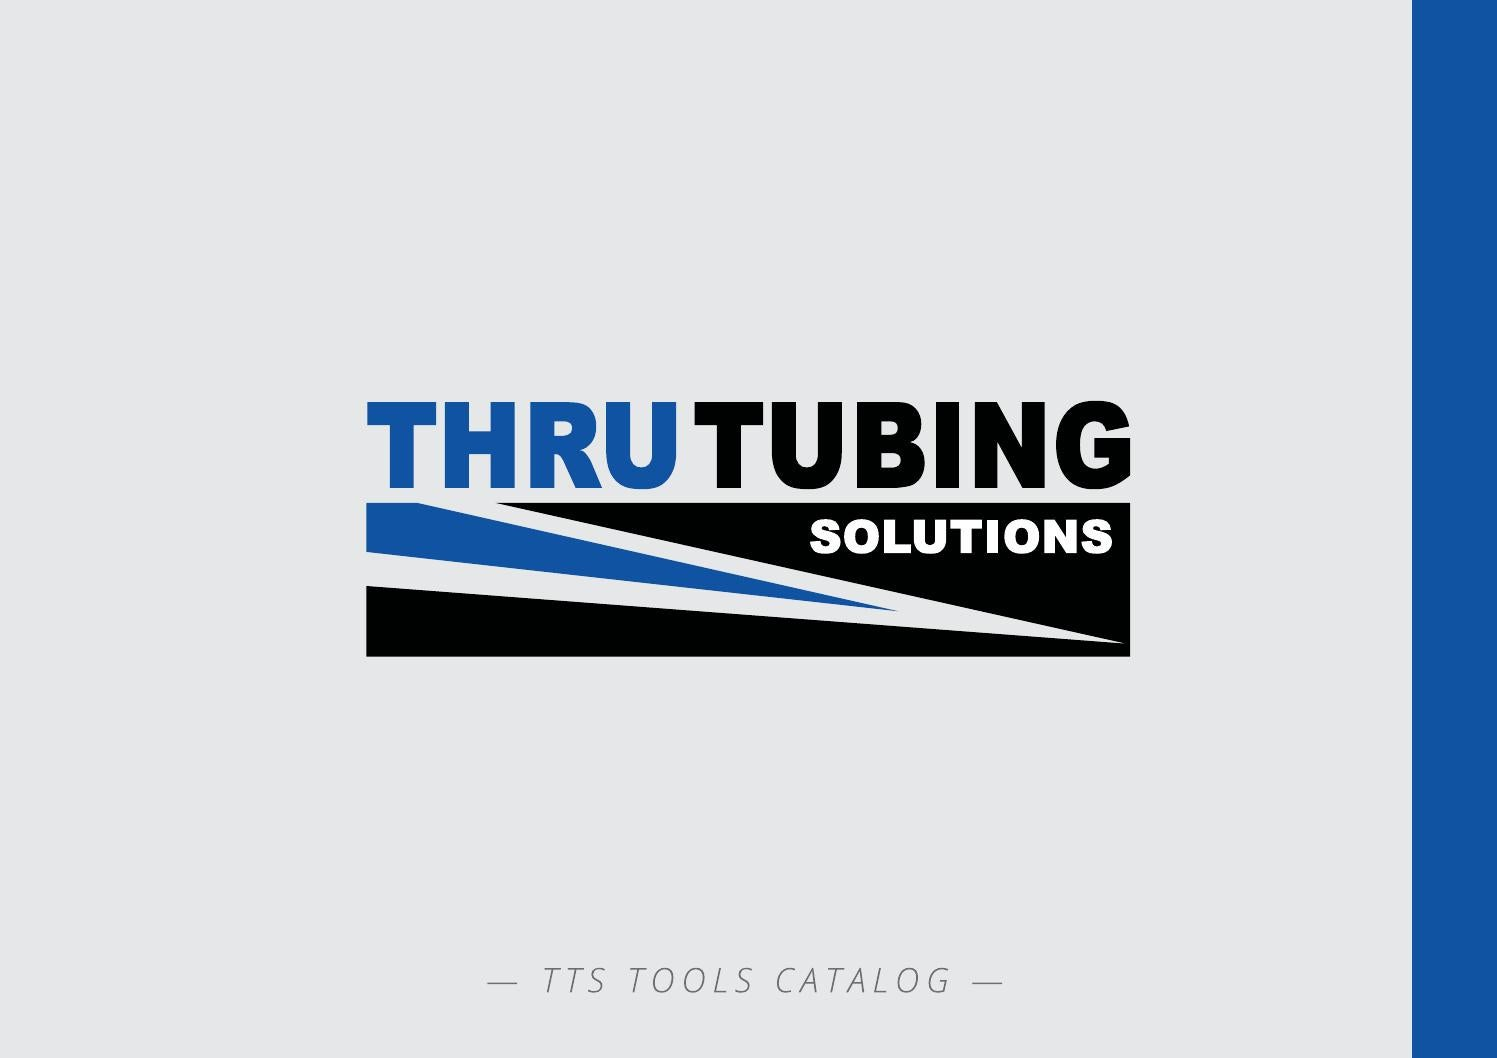 Coiled Tubing Bad Day : Thru tubing catalog by johana pardo issuu